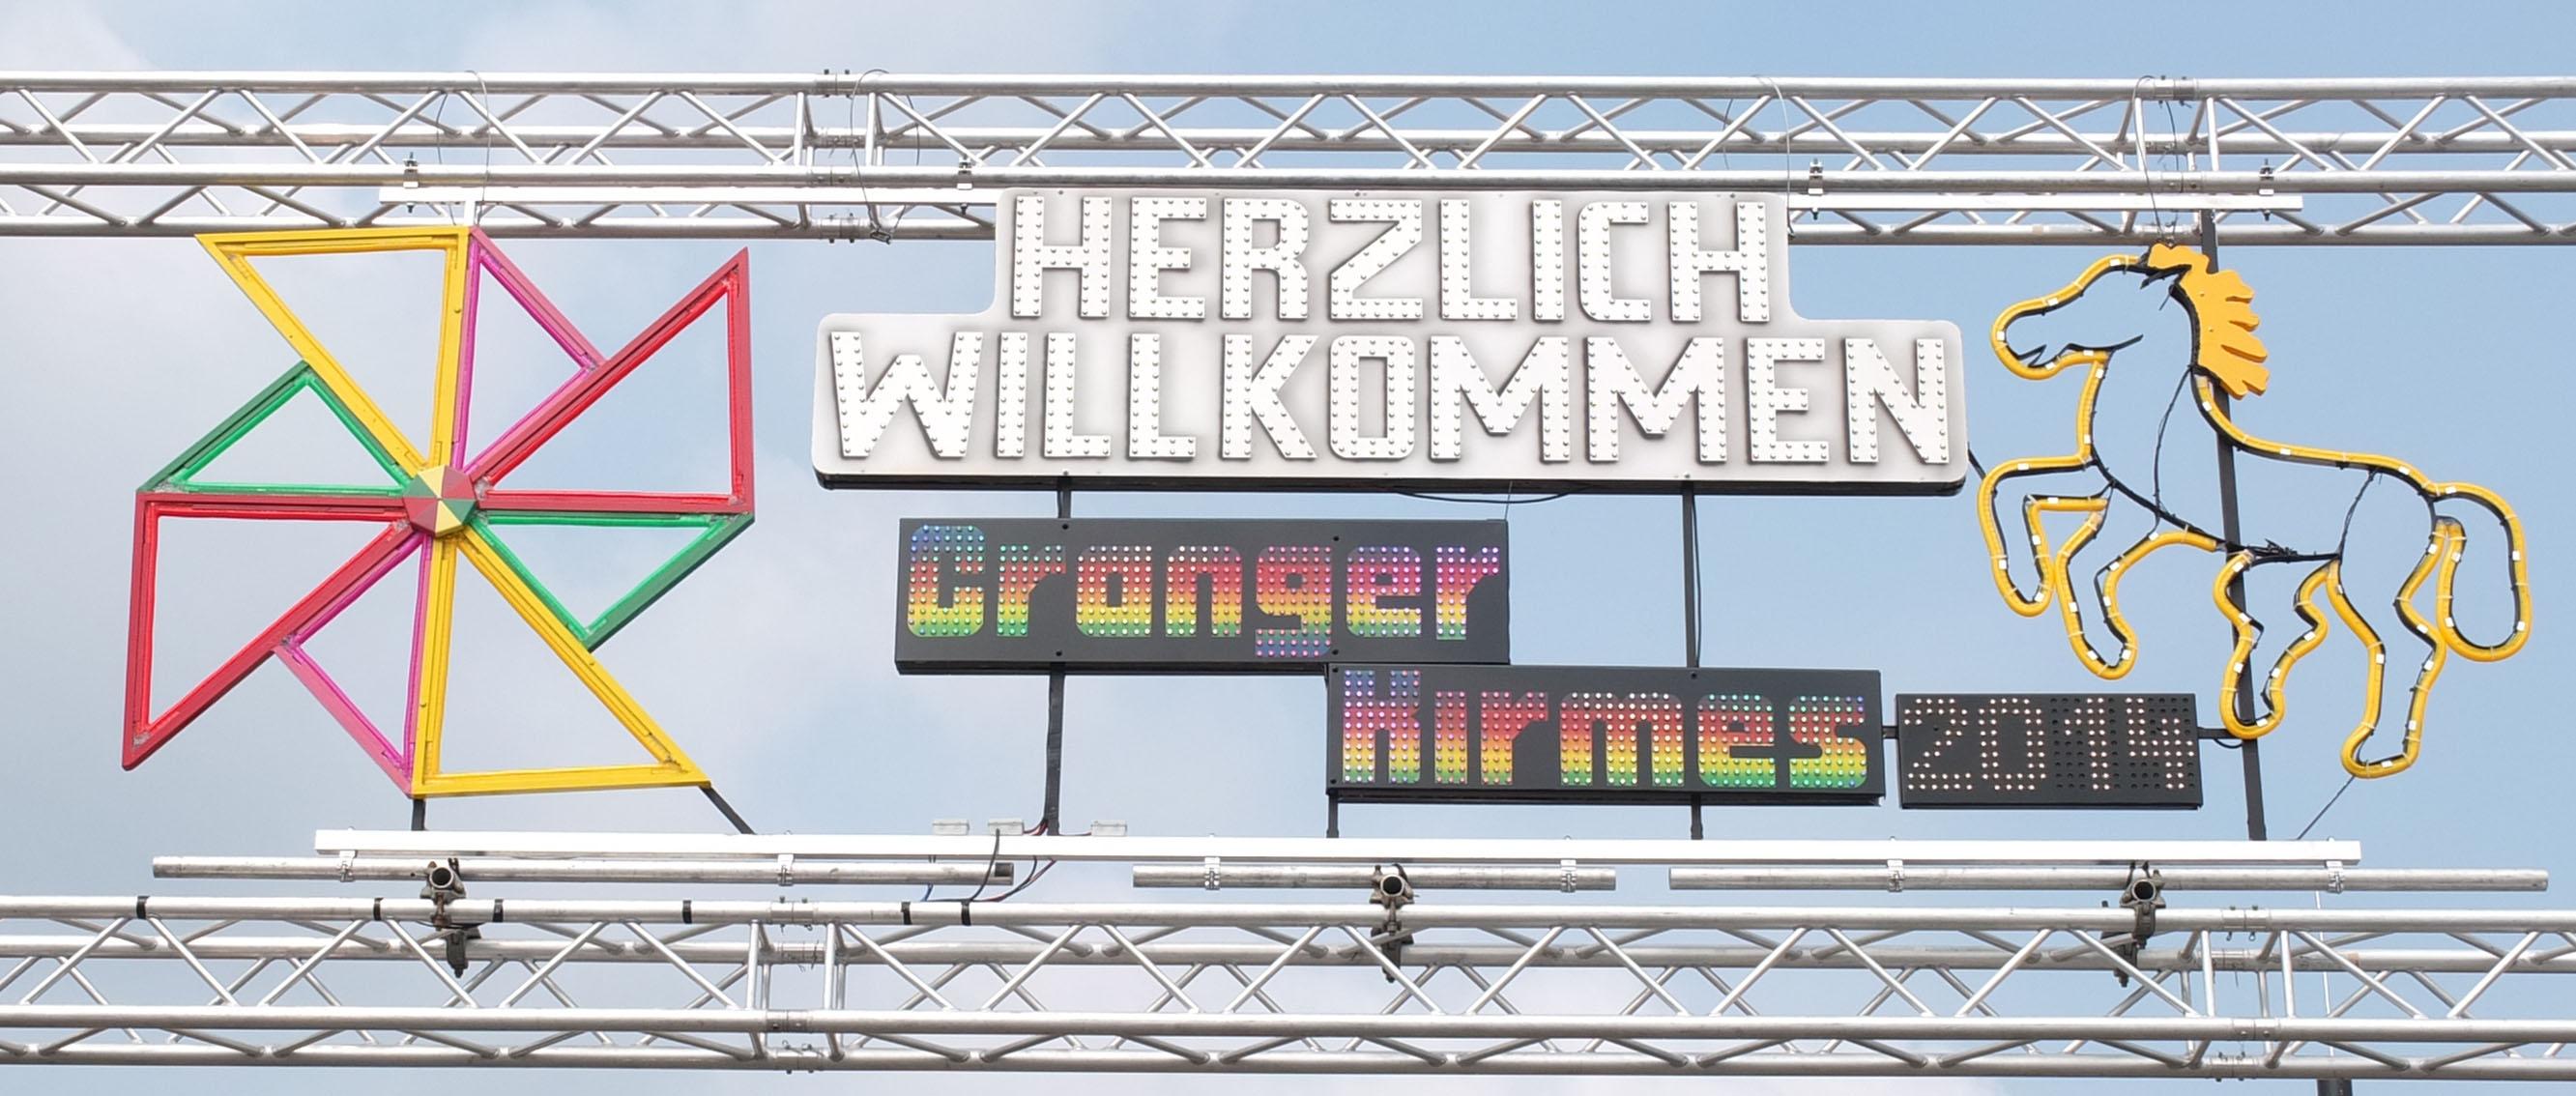 ©Michael Paternoga Stadt Herne